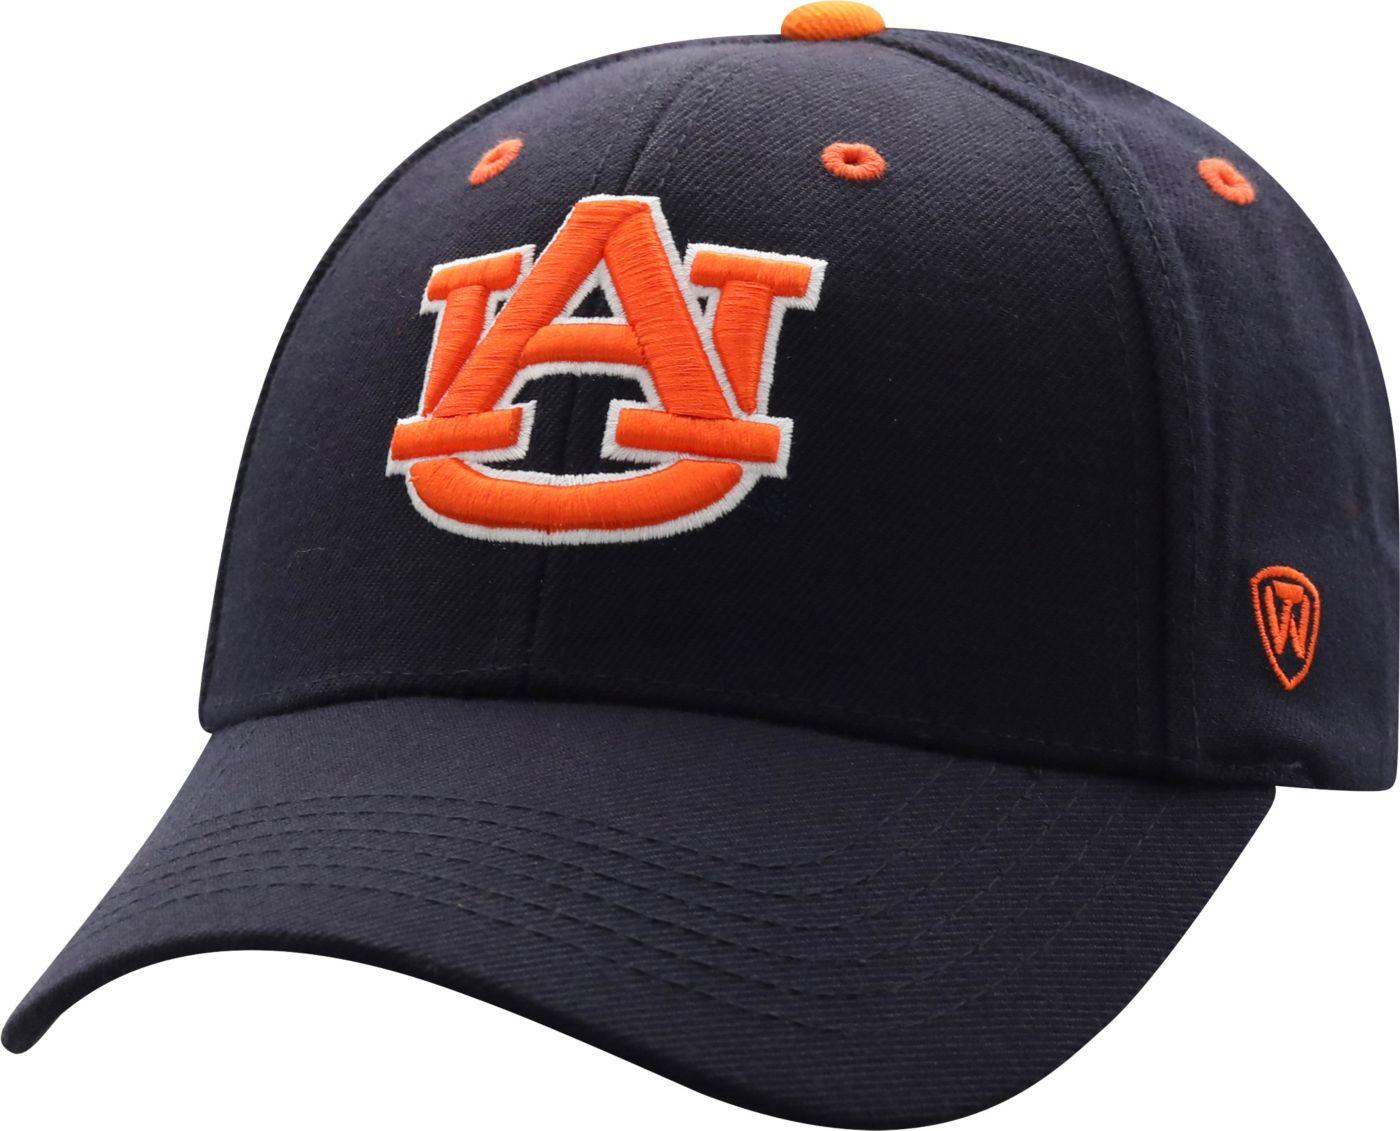 Top of the World Men's Auburn Tigers Blue Triple Threat Adjustable Hat